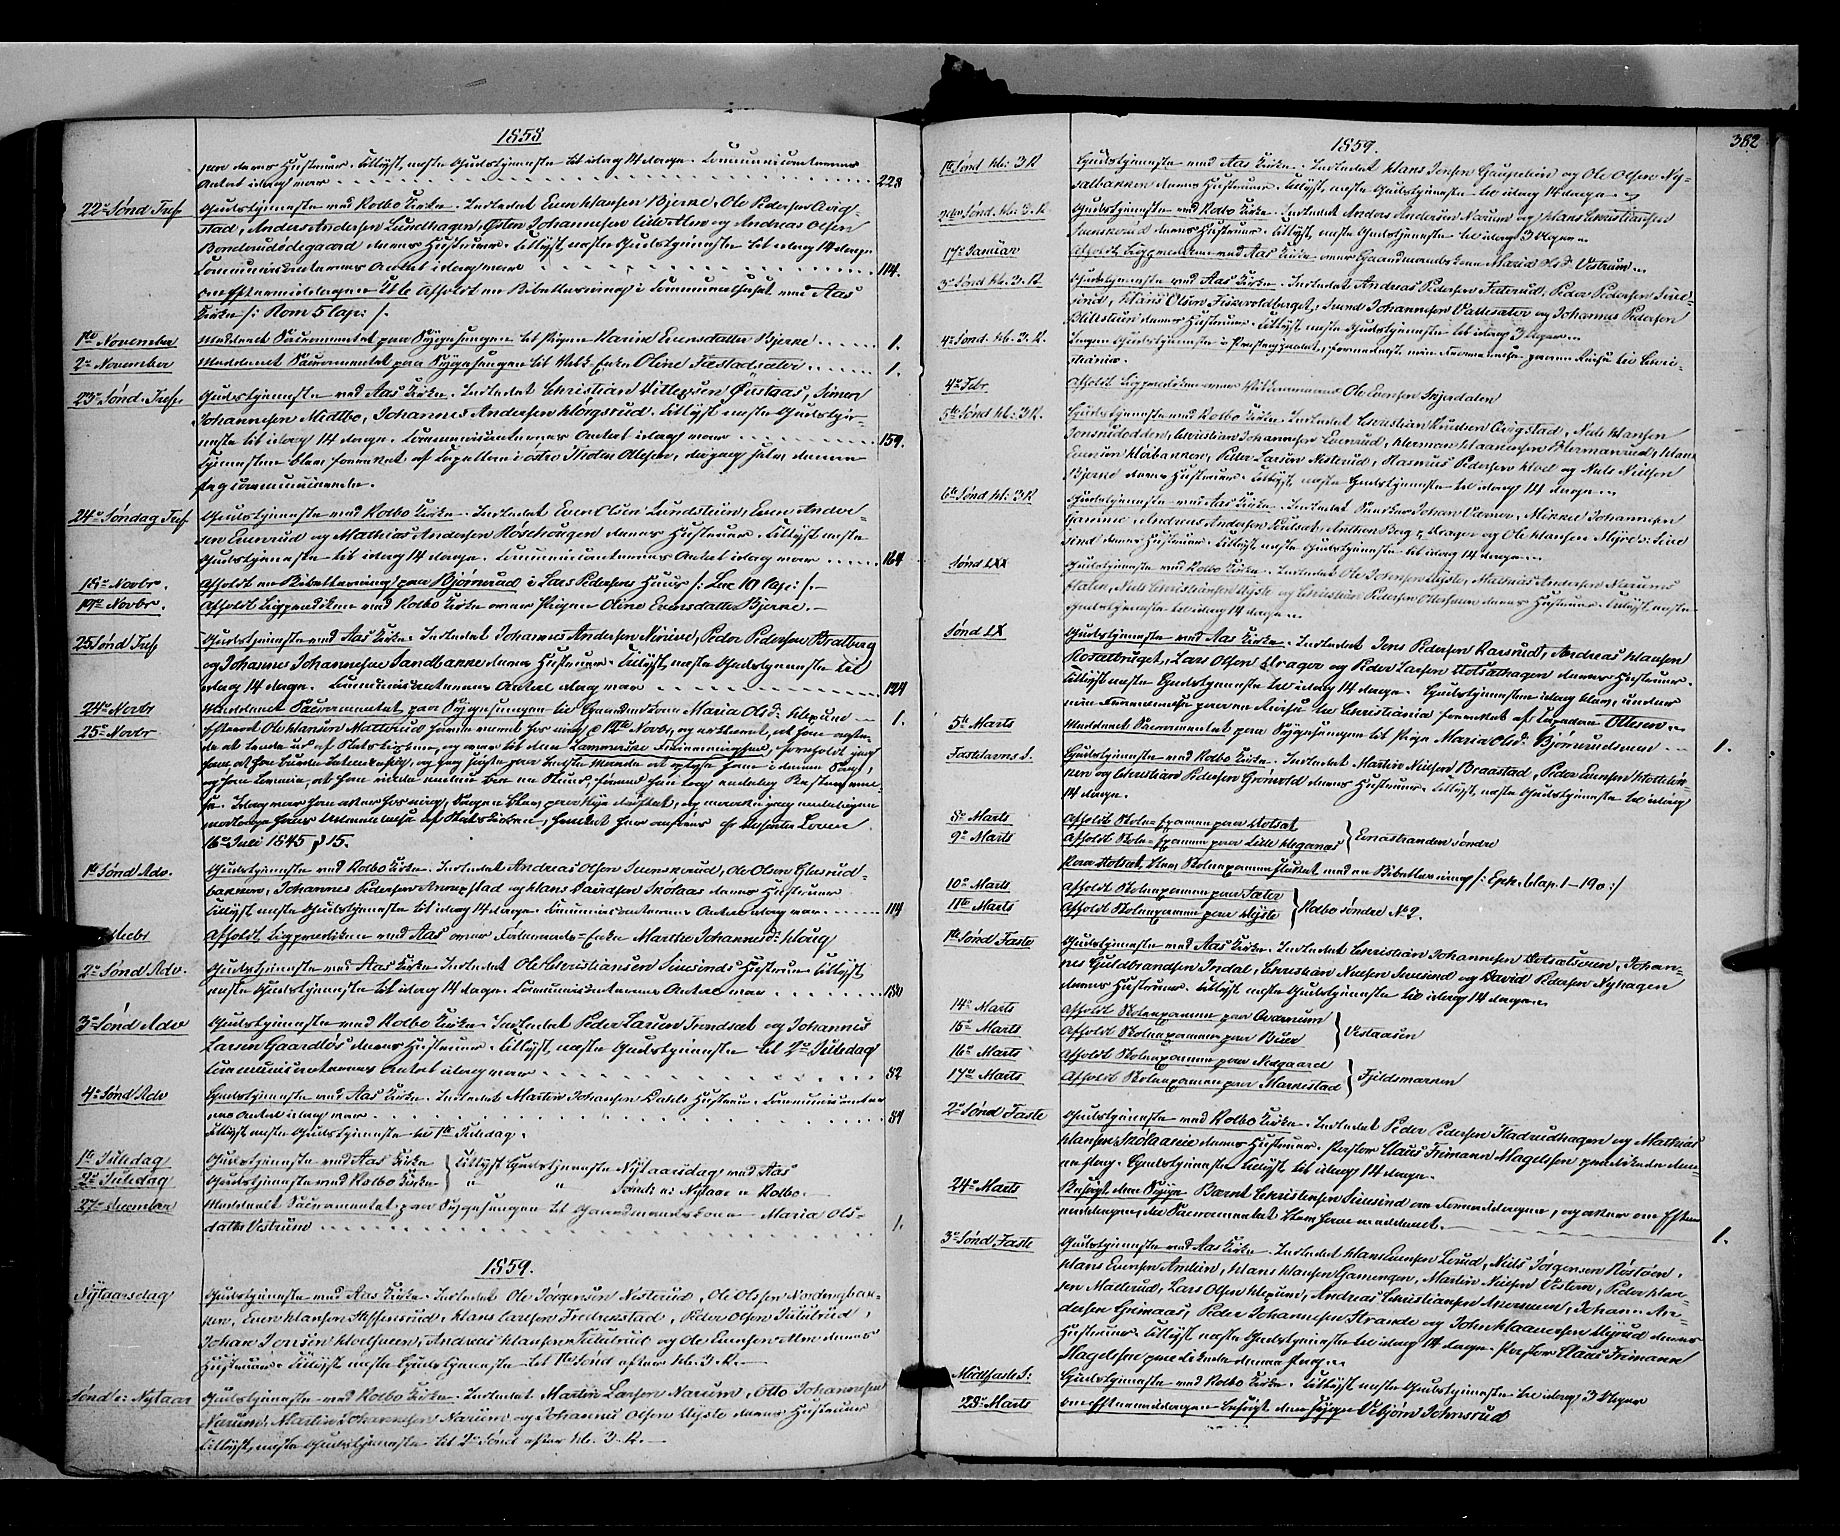 SAH, Vestre Toten prestekontor, H/Ha/Haa/L0006: Ministerialbok nr. 6, 1856-1861, s. 382